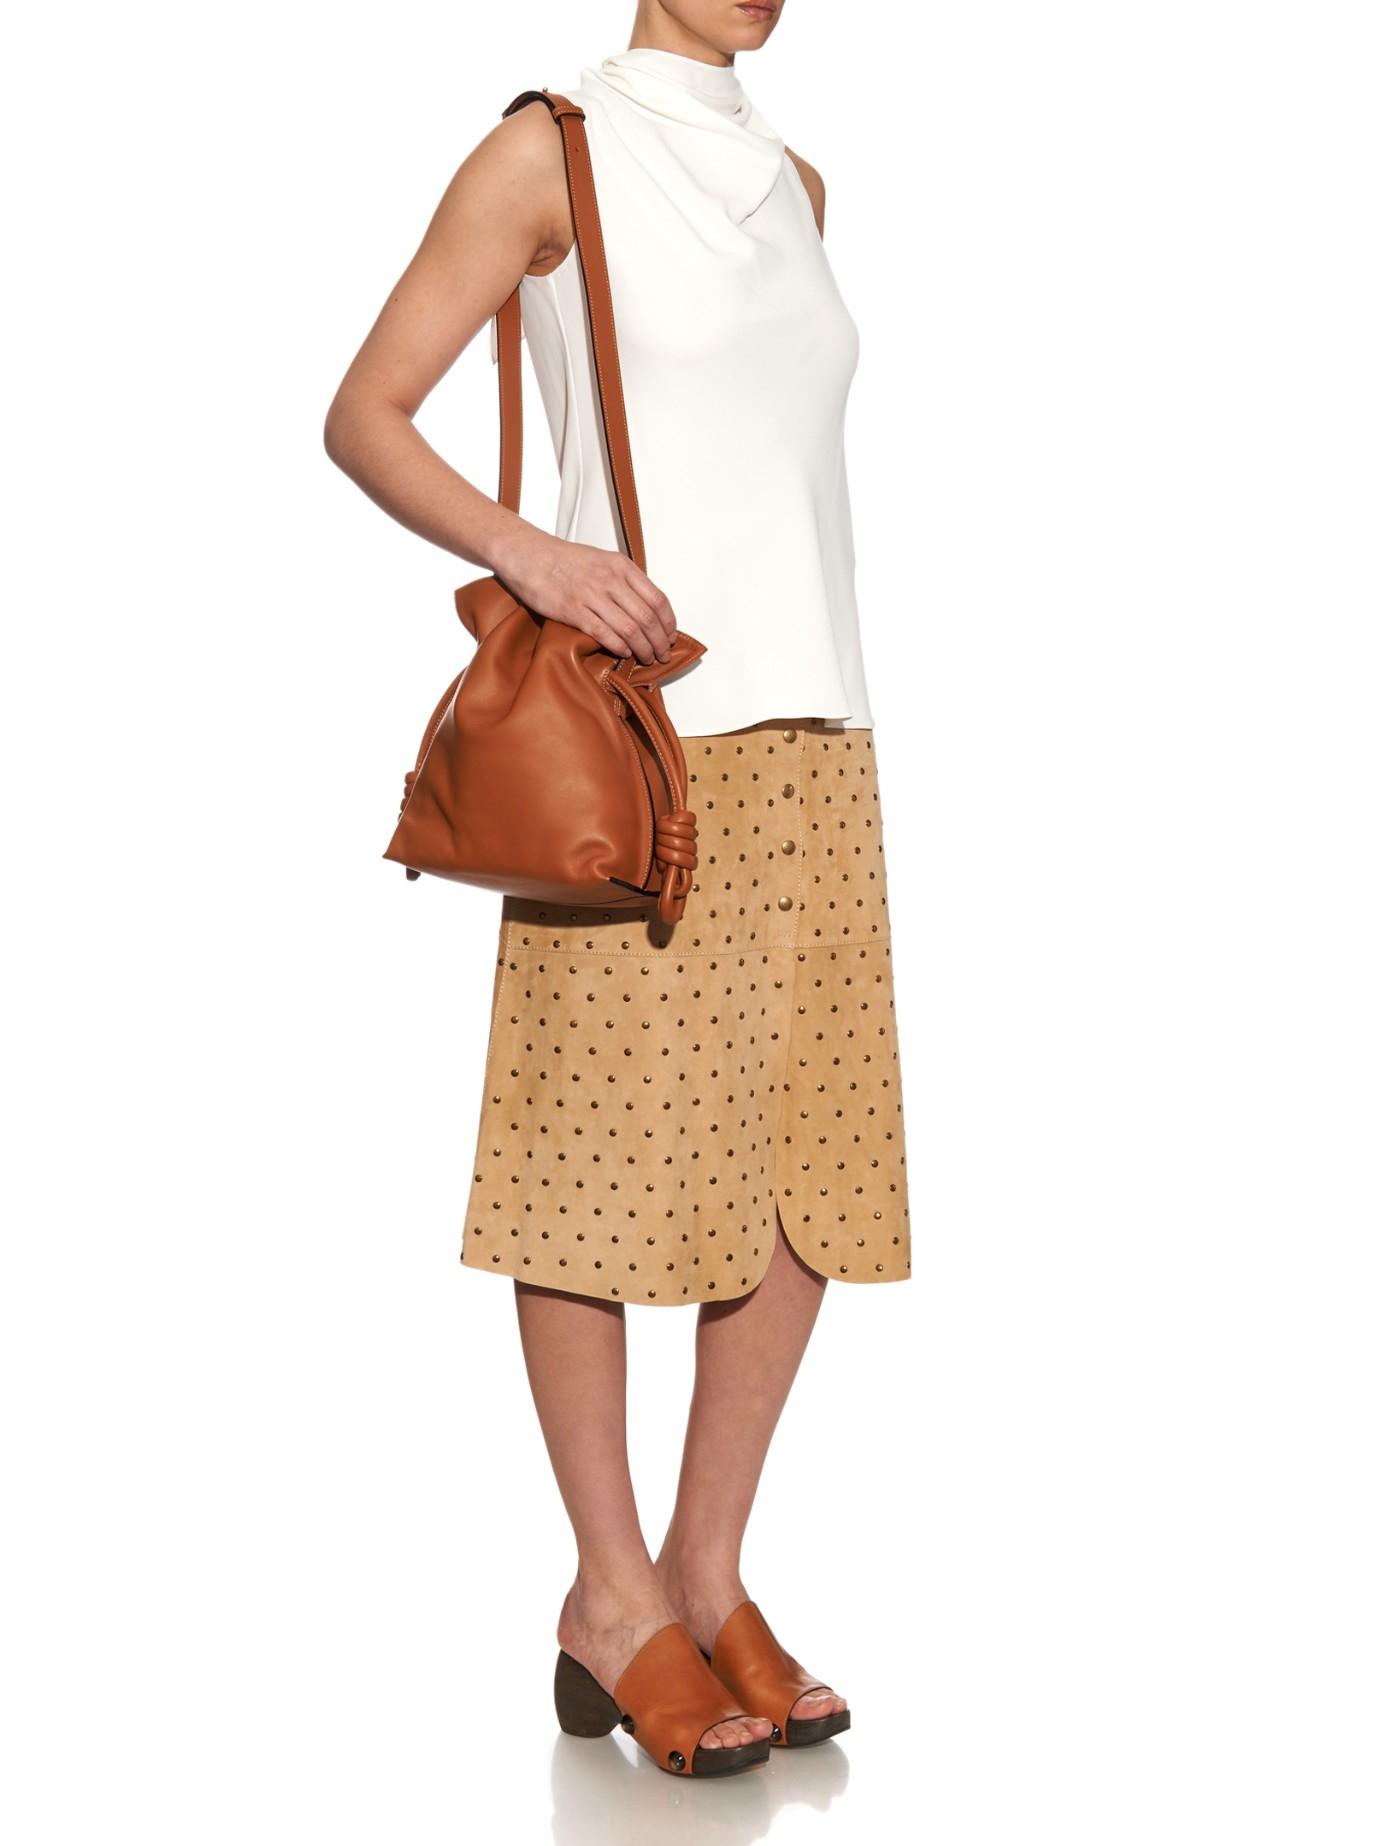 ddba5529c82b Lyst - Loewe Flamenco Knot Leather Bag in Brown